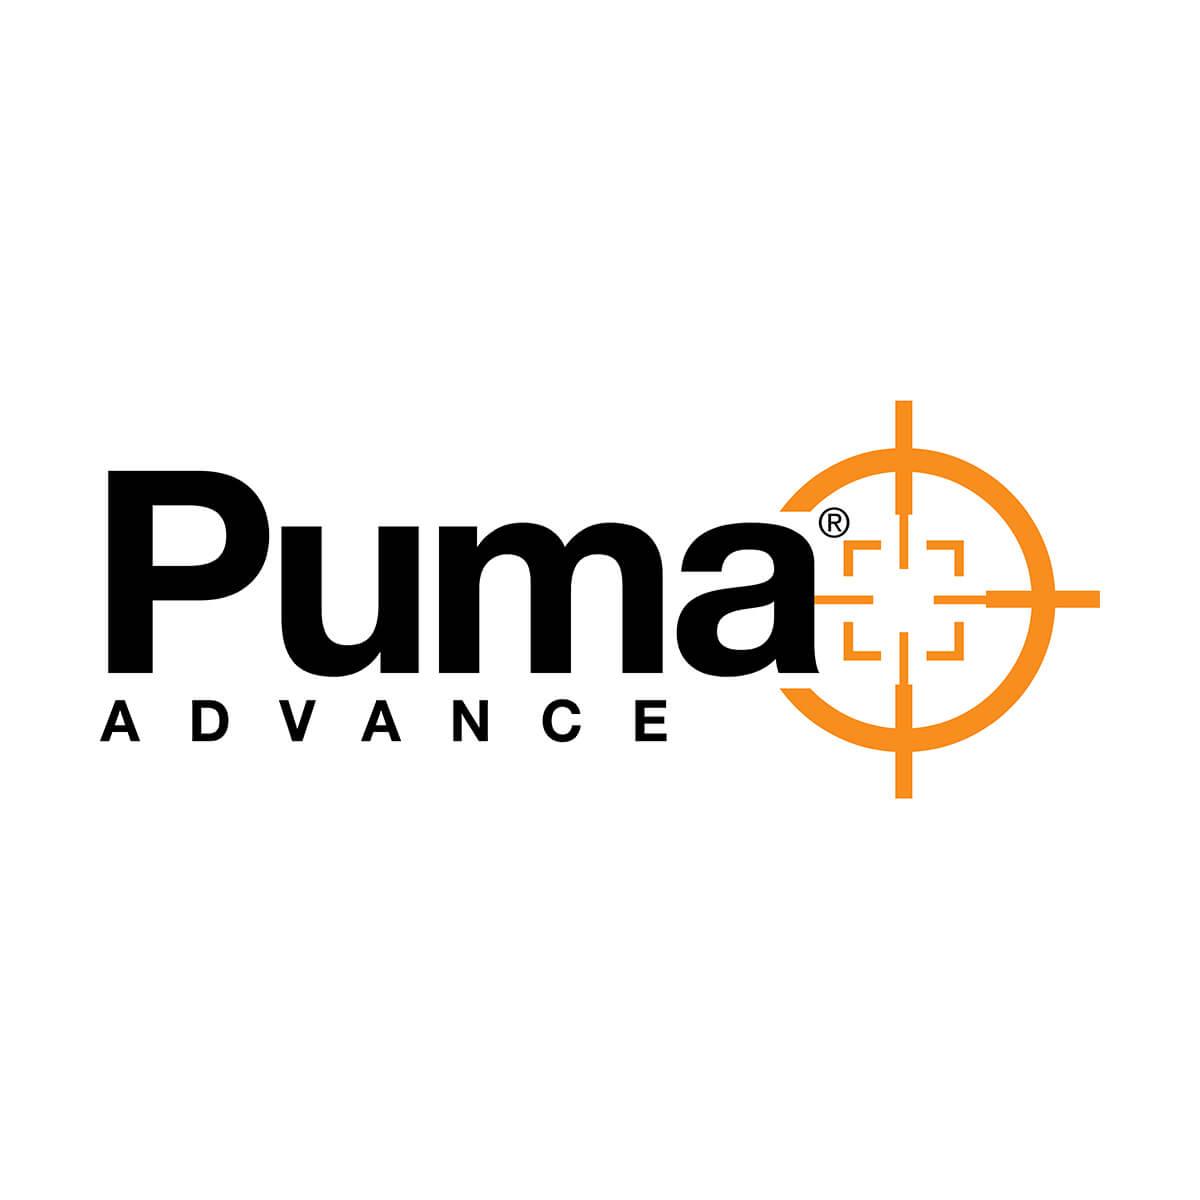 Puma Advance - 412.5L Tote